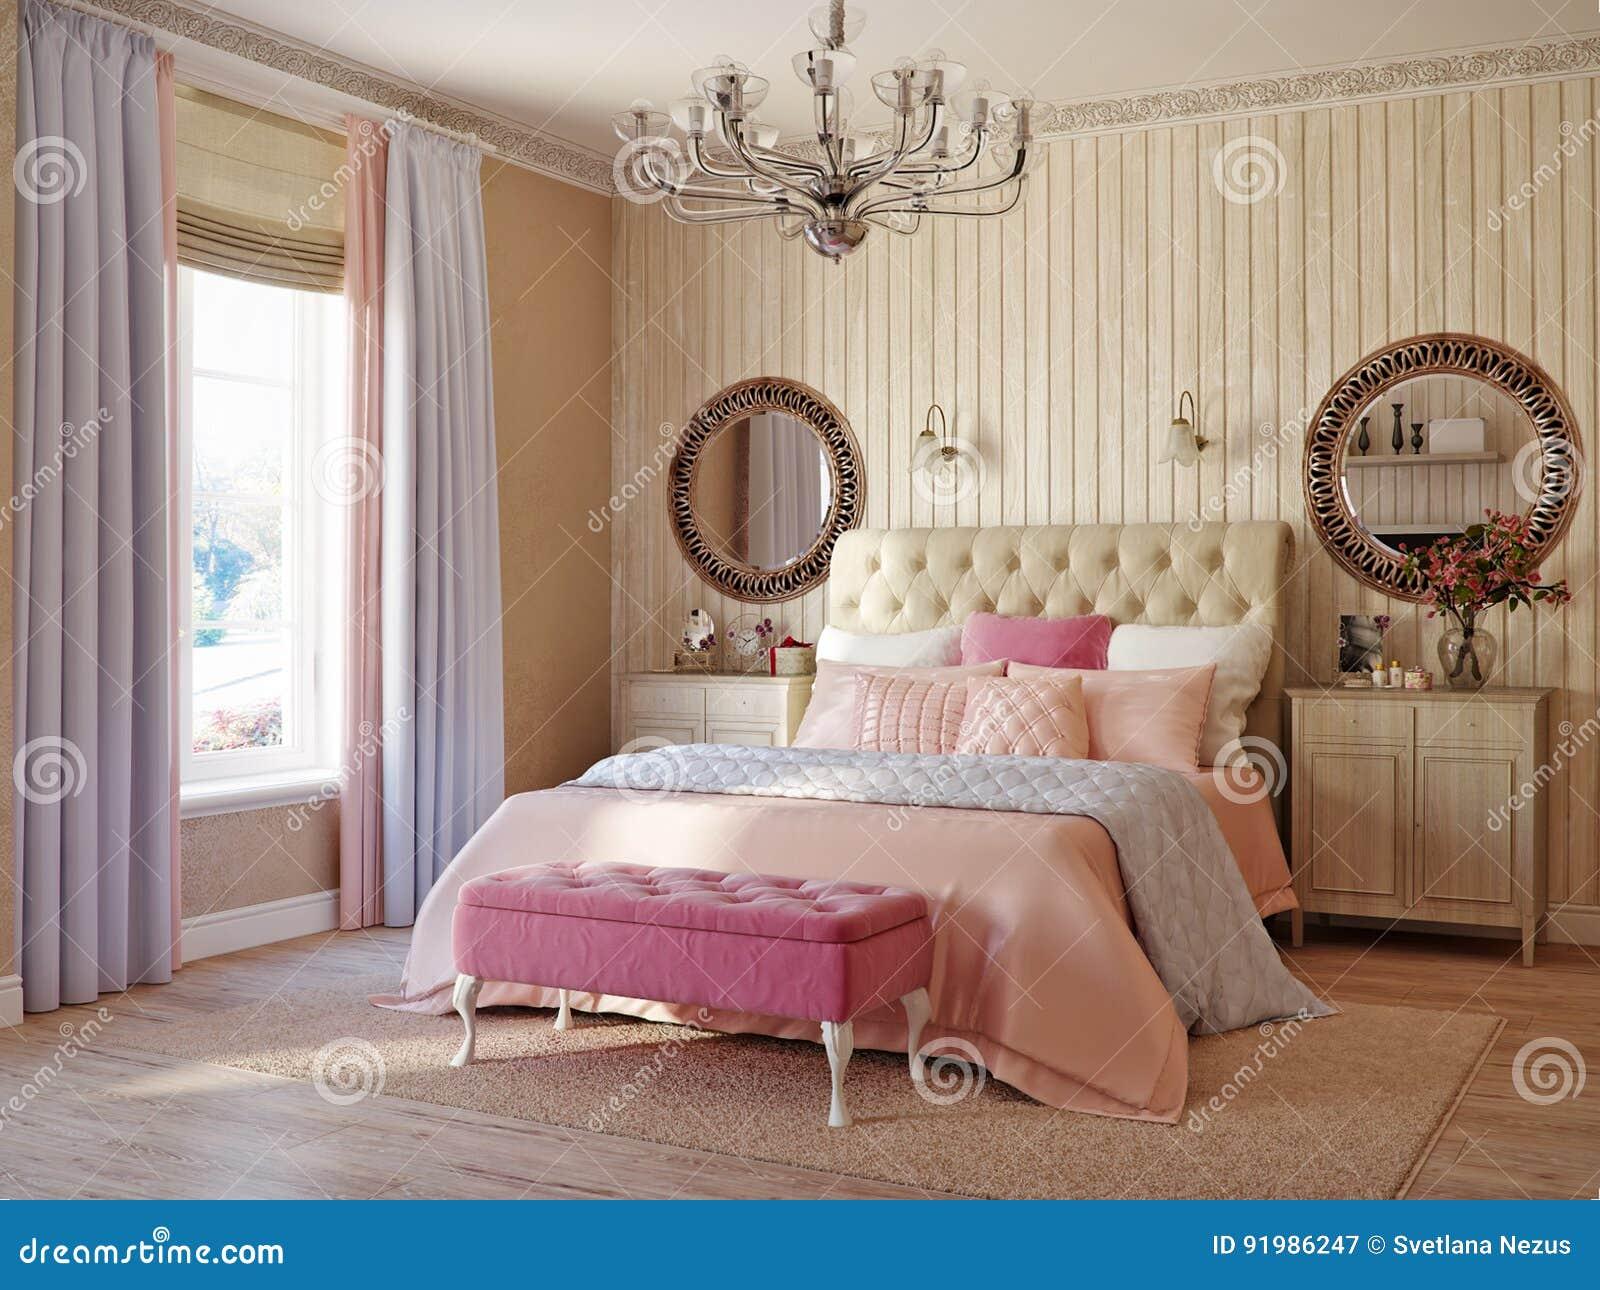 Camera Da Letto Rustica Moderna : Camera da letto rustica moderna classica tradizionale della provenza